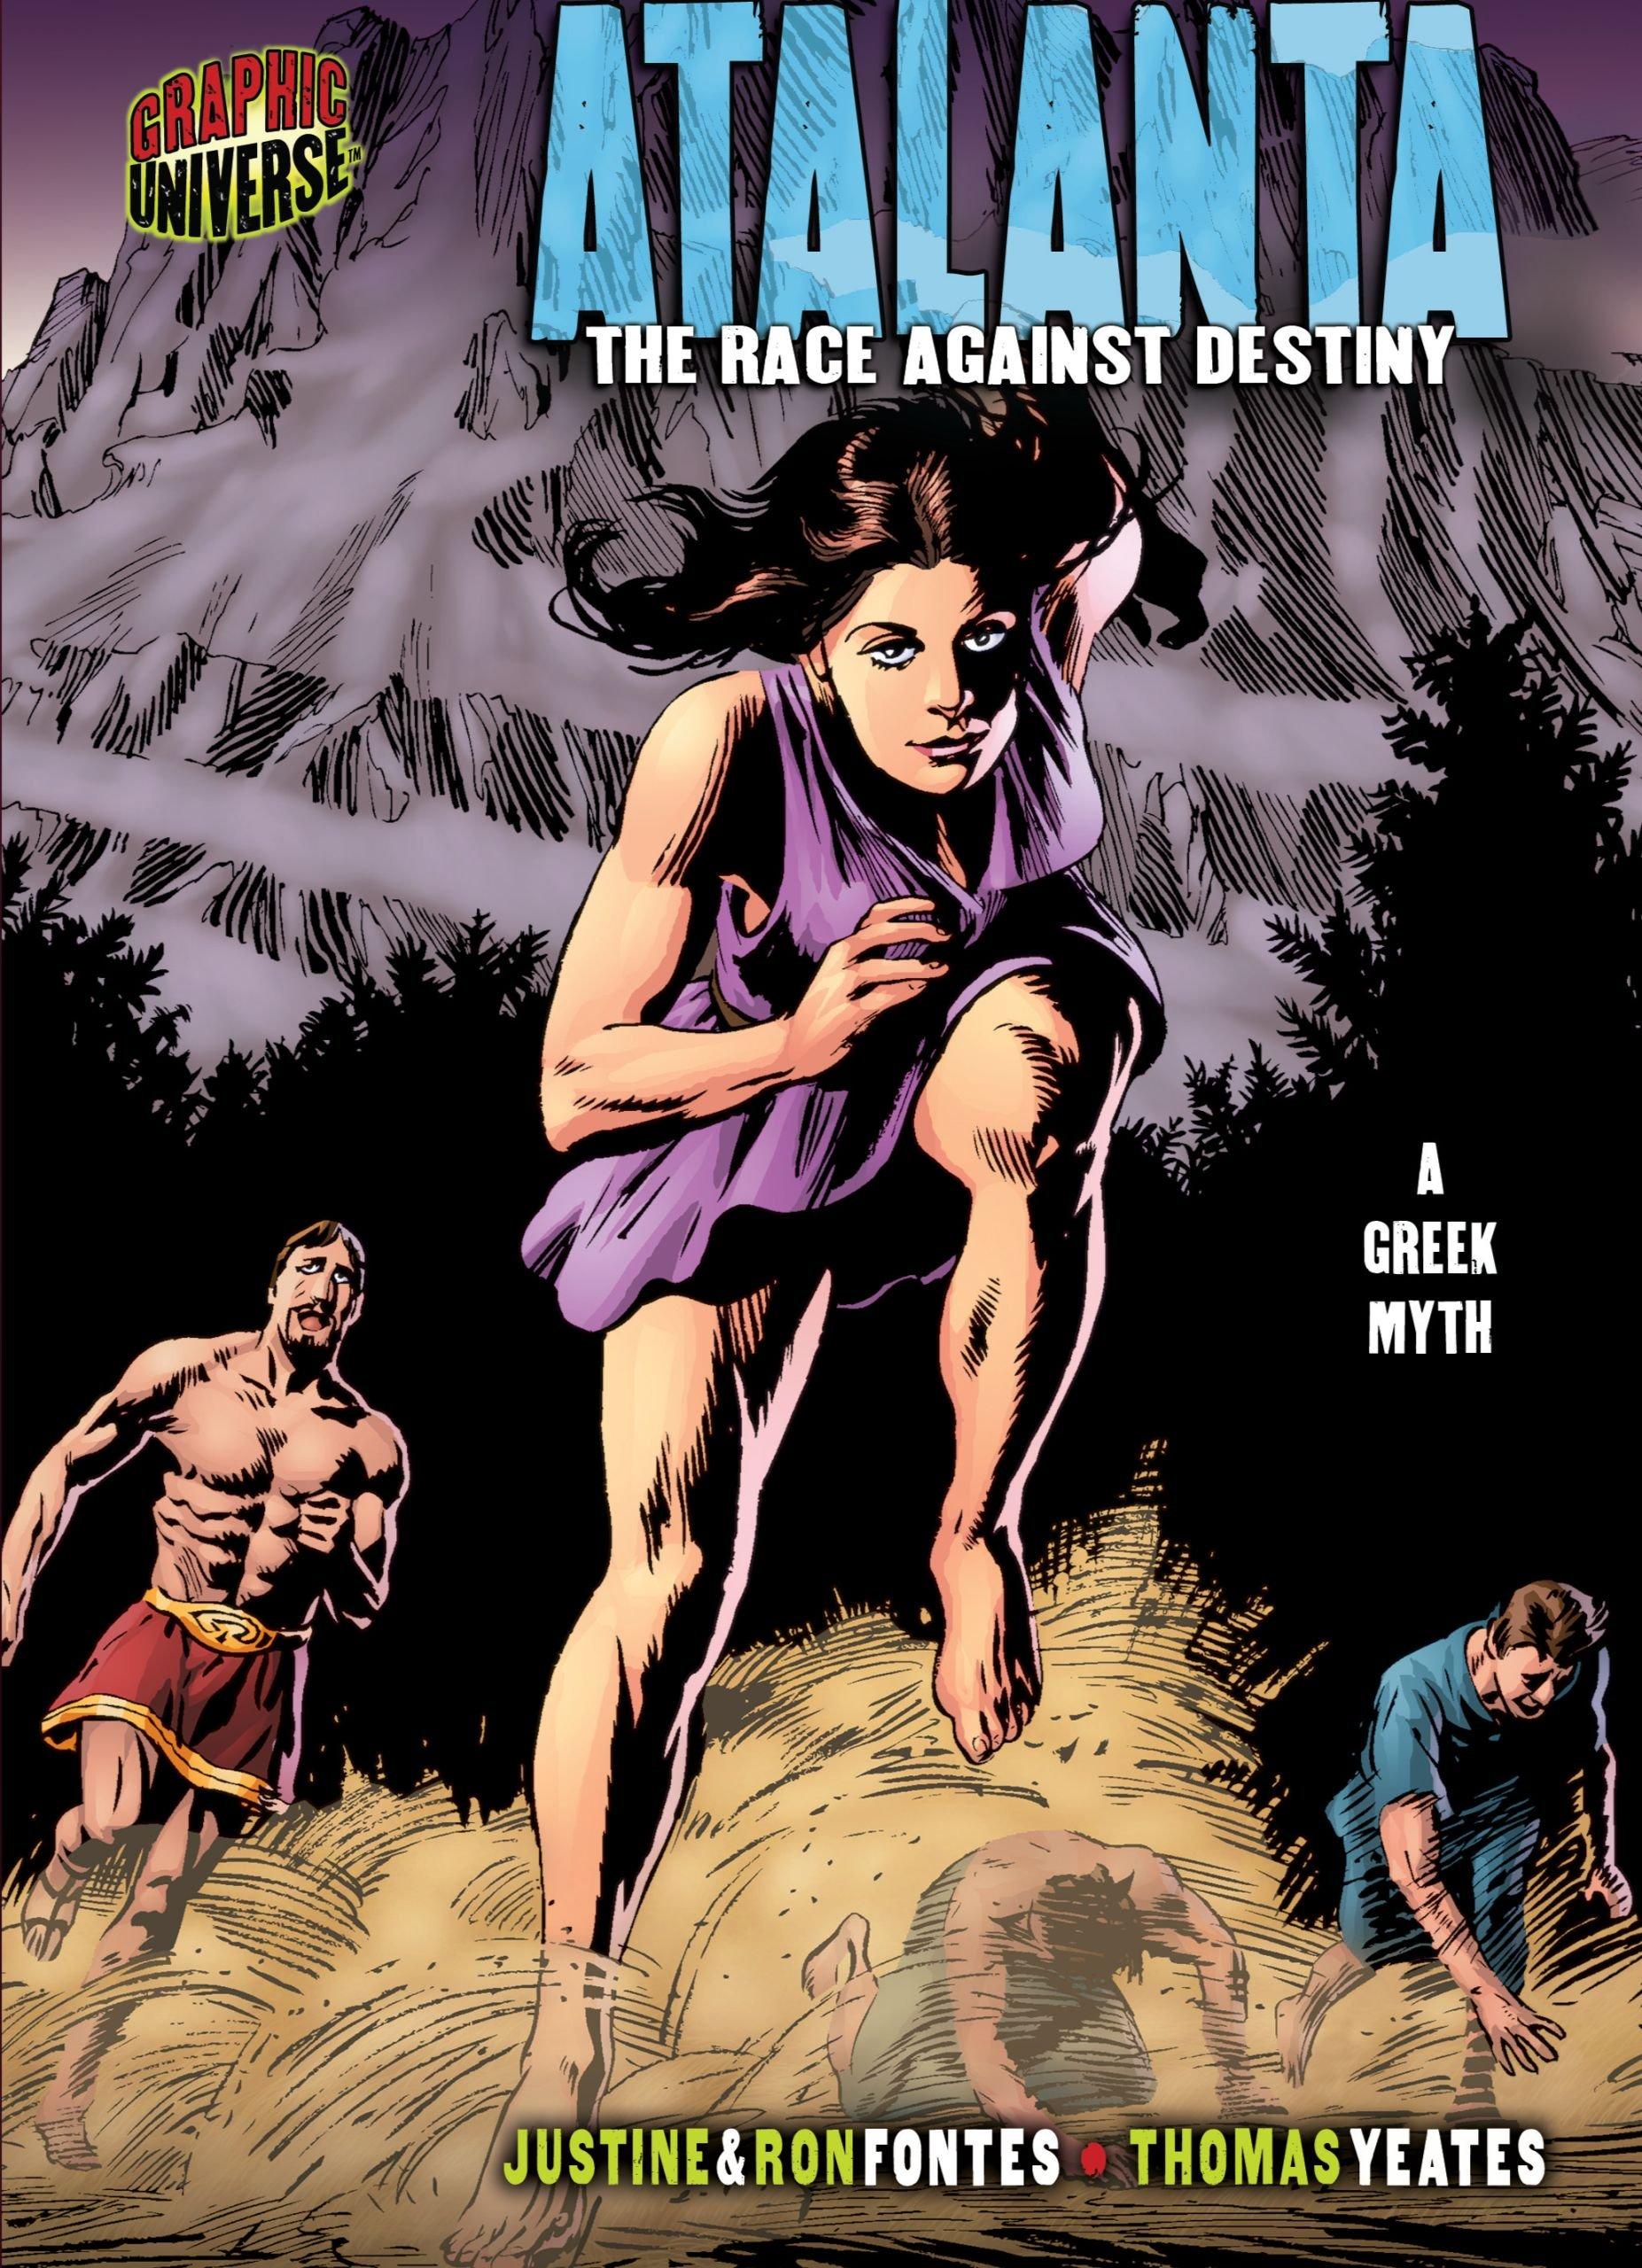 Atalanta: The Race Against Destiny Graphic Myths and Legends ...